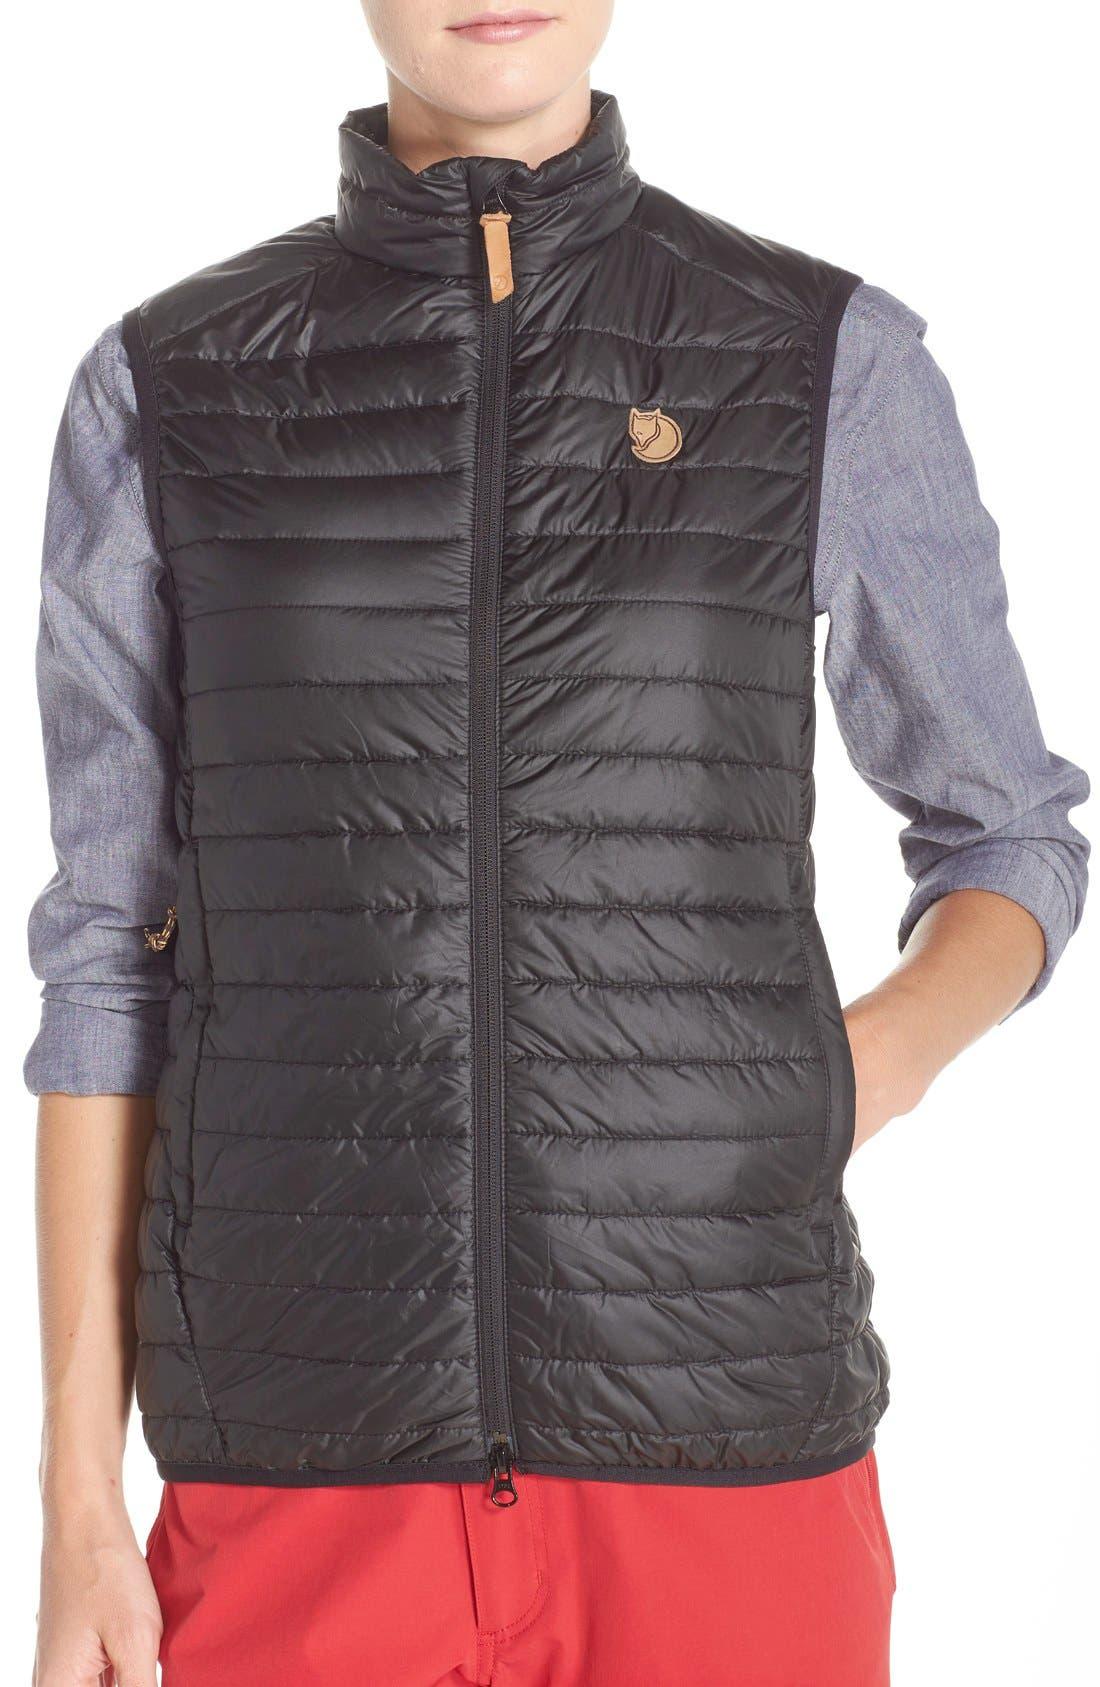 'Abisko' Insulated Vest